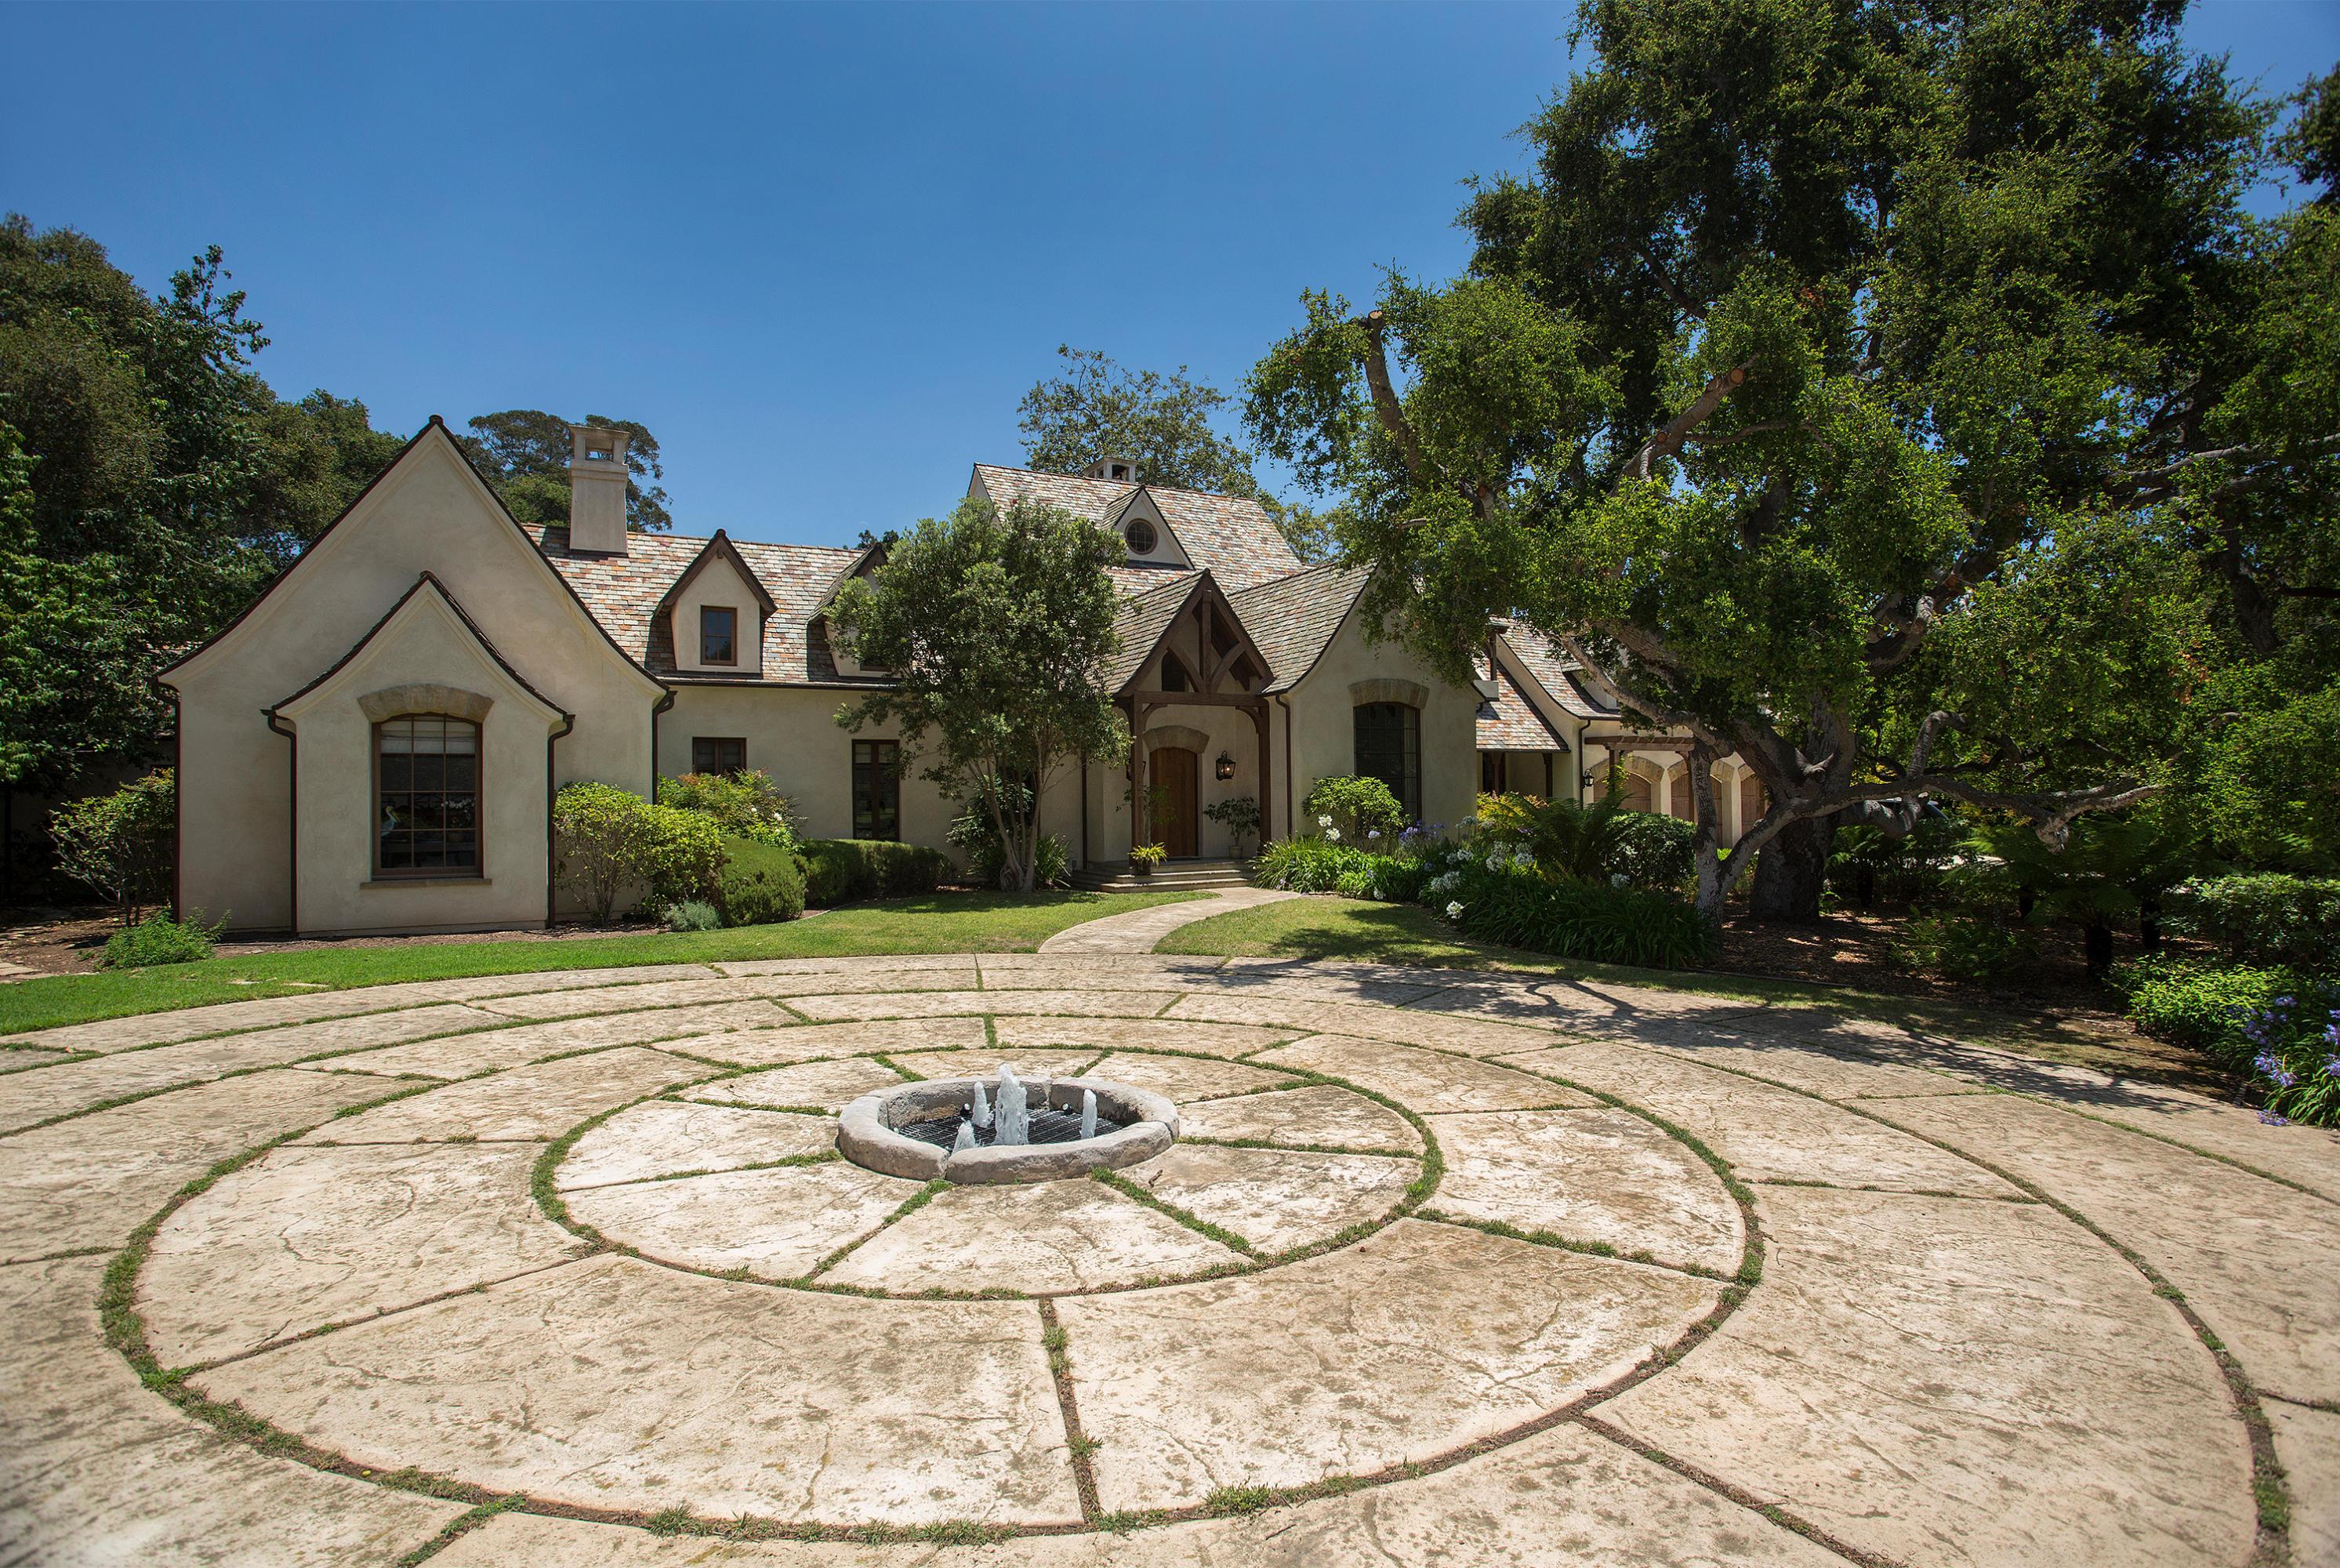 Property photo for 1445 S Jameson Ln Santa Barbara, California 93108 - 15-2347